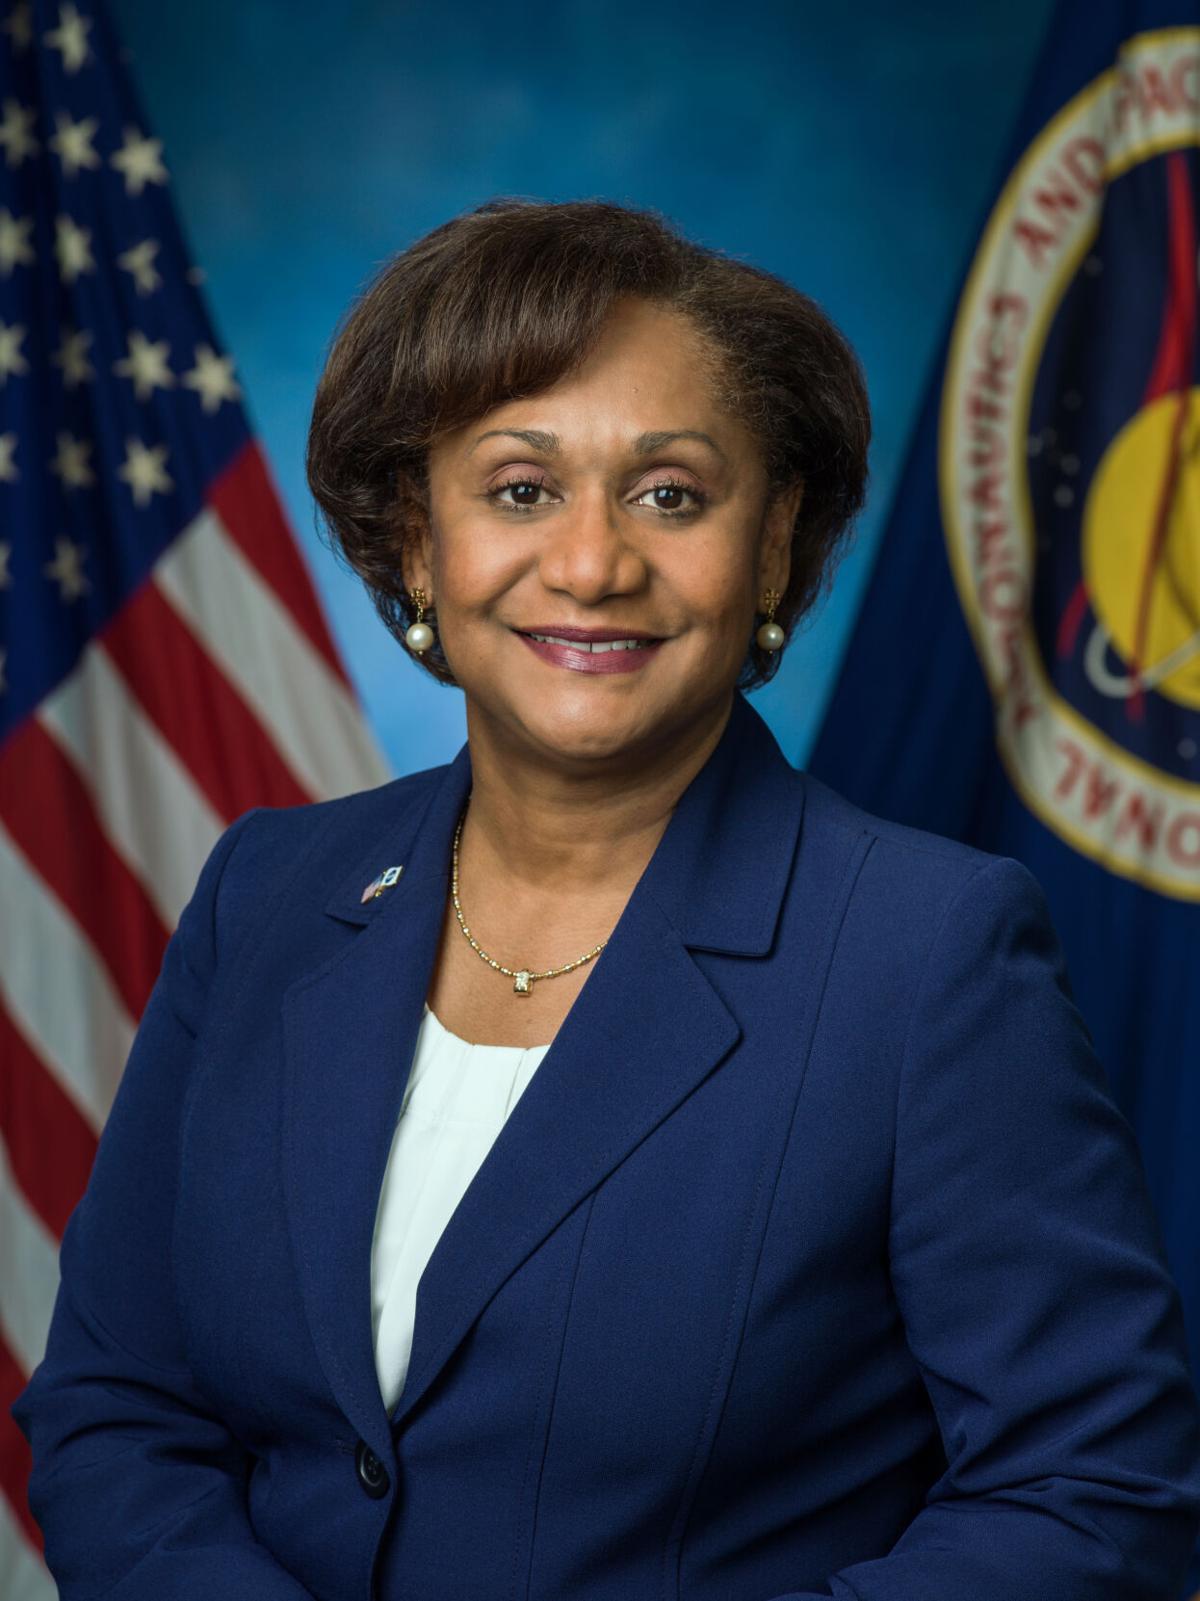 Vanessa Wyche, director of the NASA's Johnson Space Center in Houston